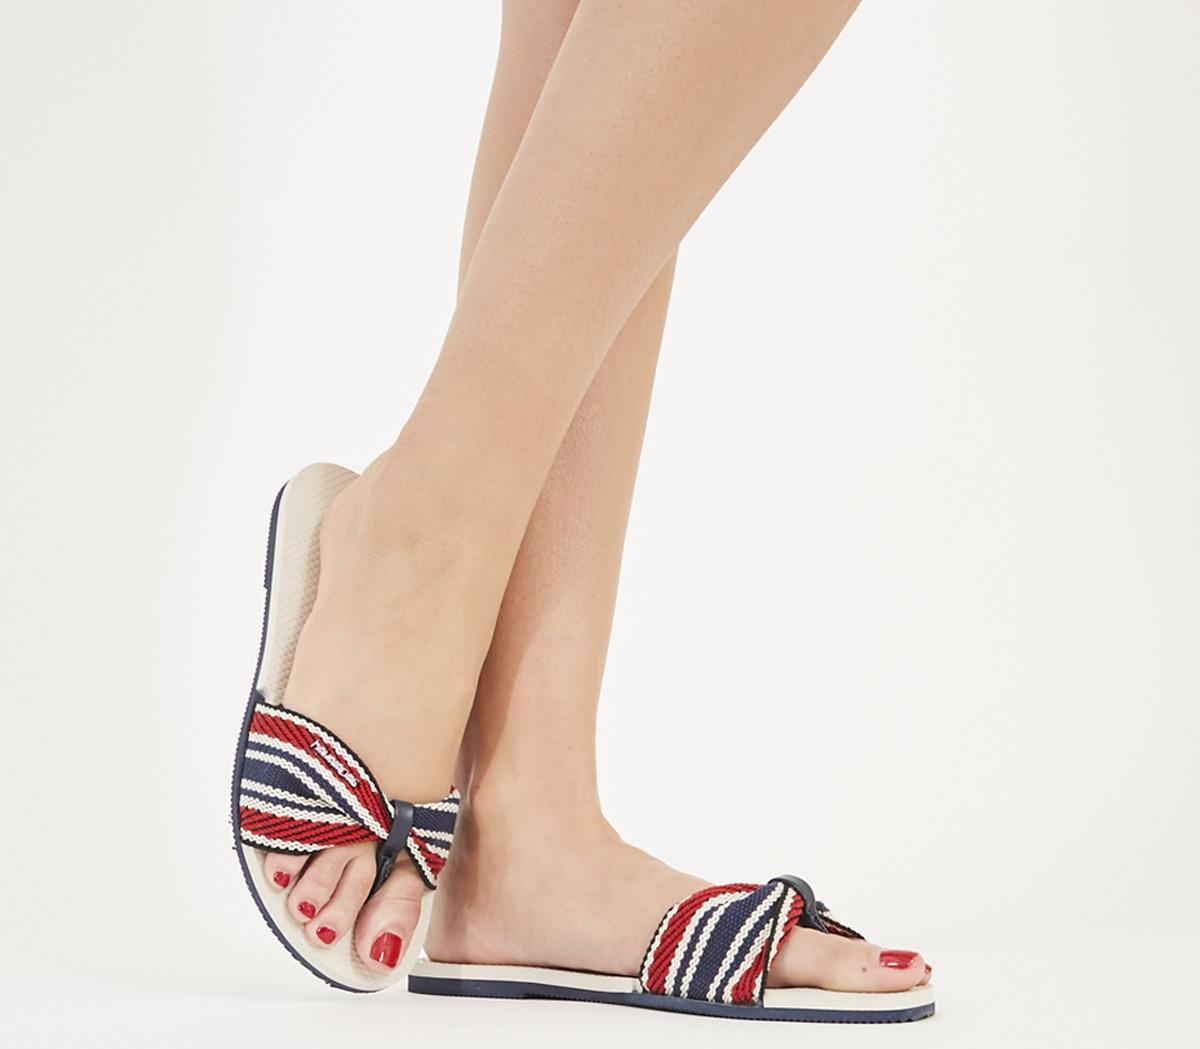 You St Tropez Fita Sandals